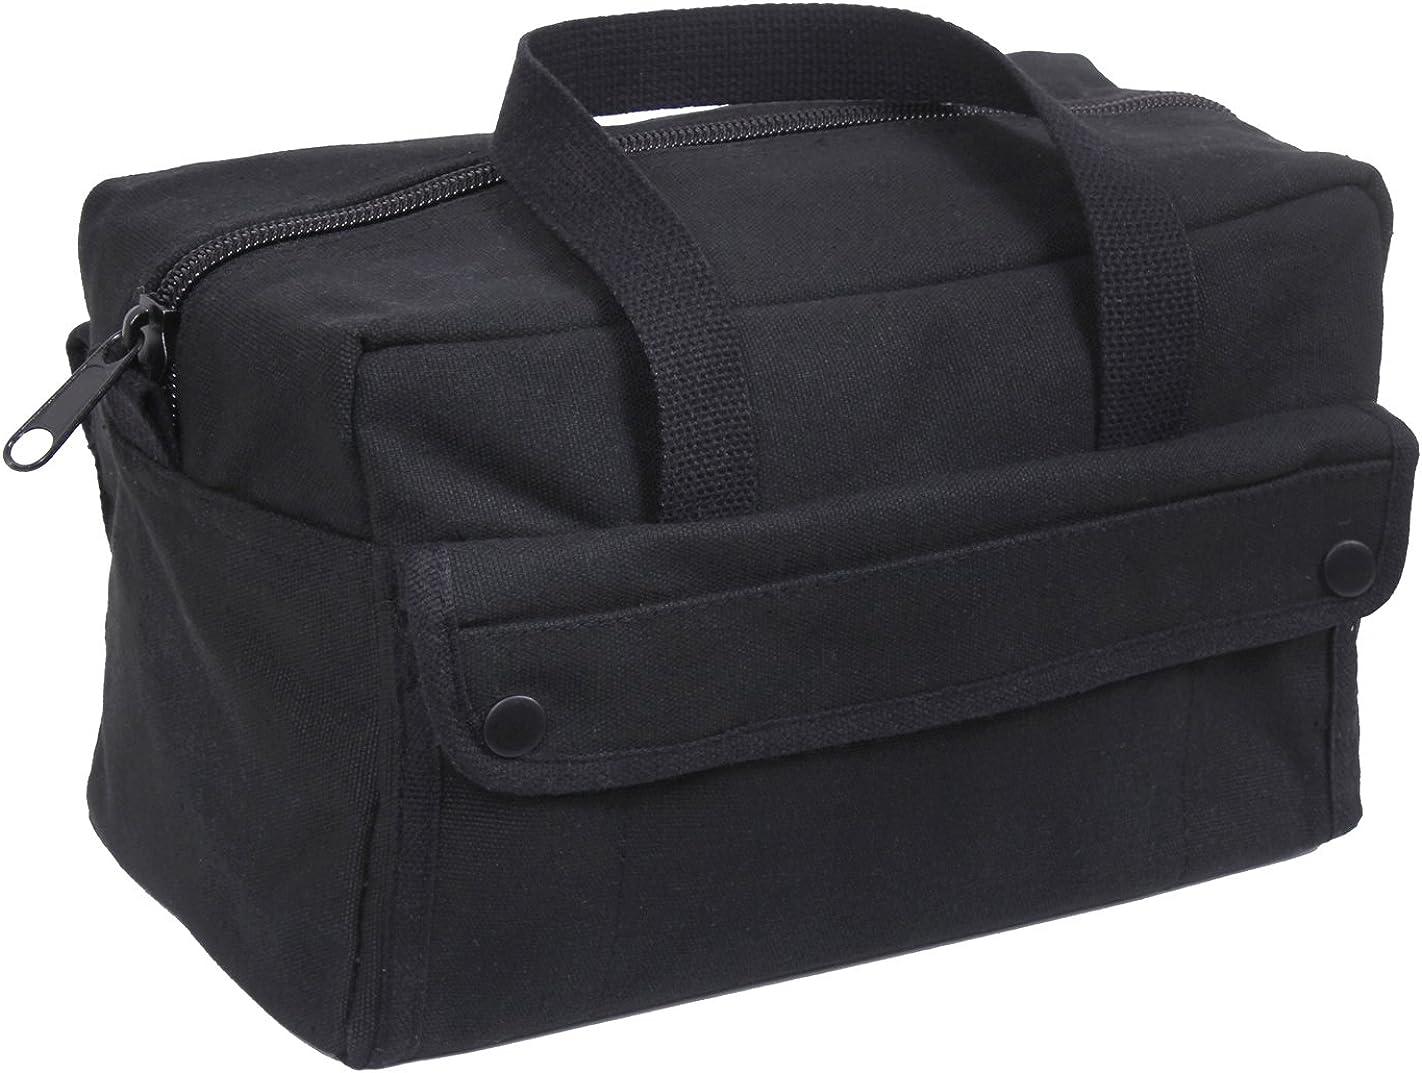 Rothco G.I. Type Mechanics Tool Bags, Black: Sports & Outdoors